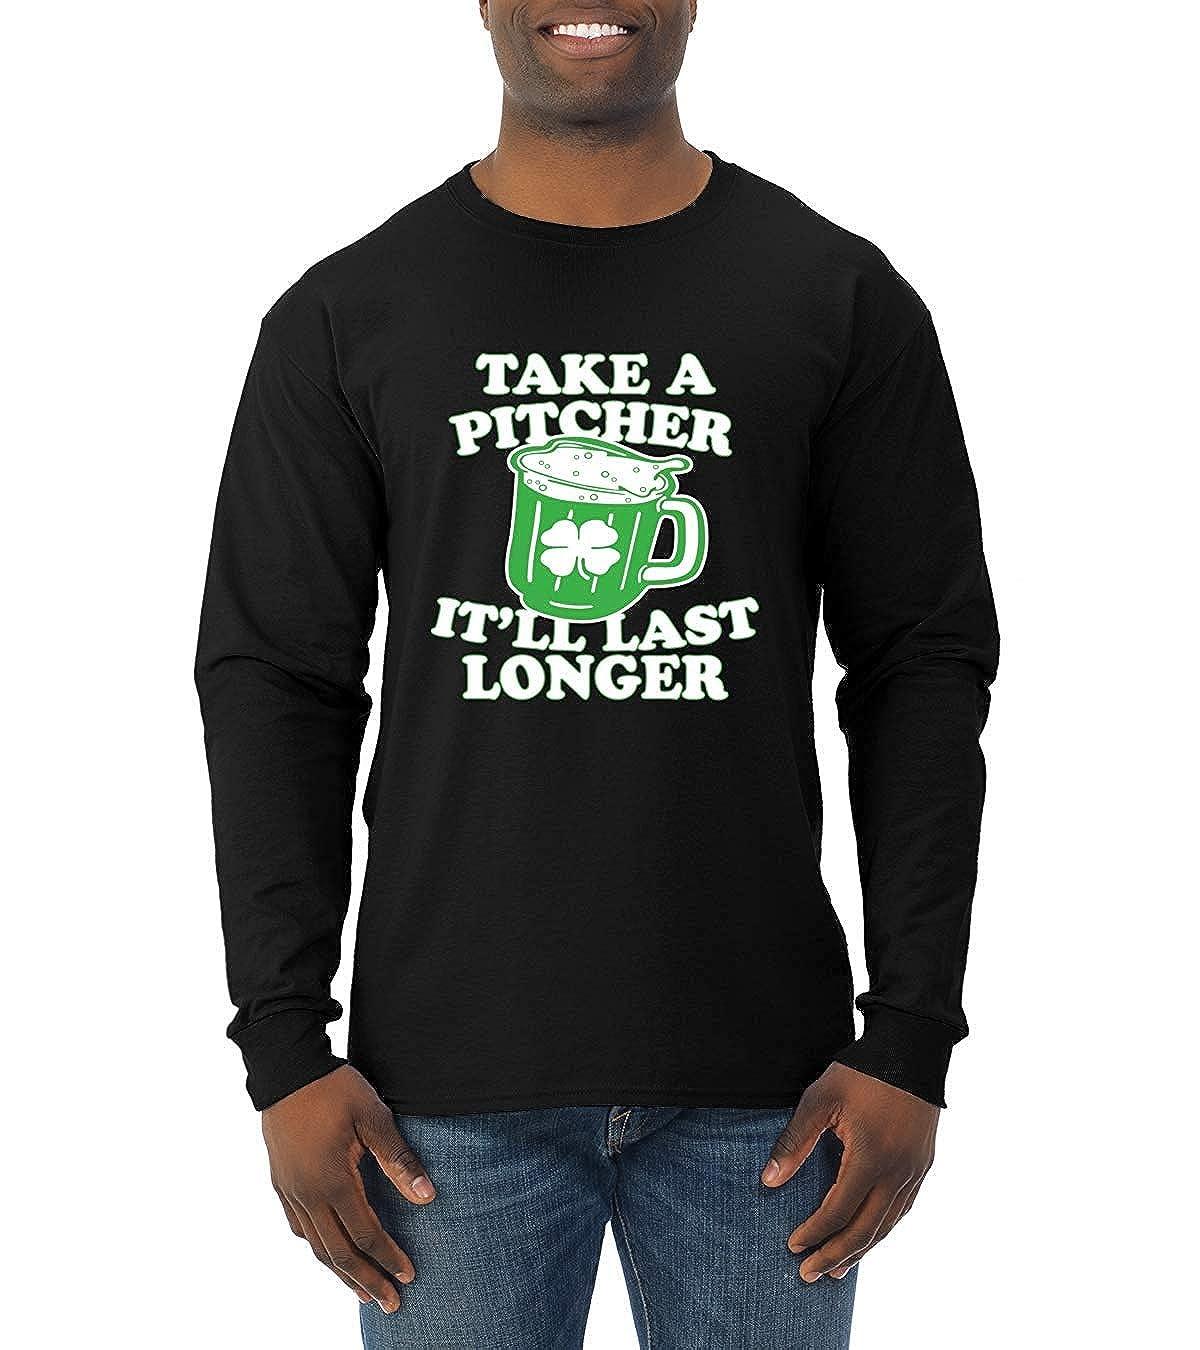 0e25d004e HOLDWOO TESS Take a Pitcher It'll Last Longer St. Patrick's Day Long Sleeve  T-Shirt Black | Amazon.com